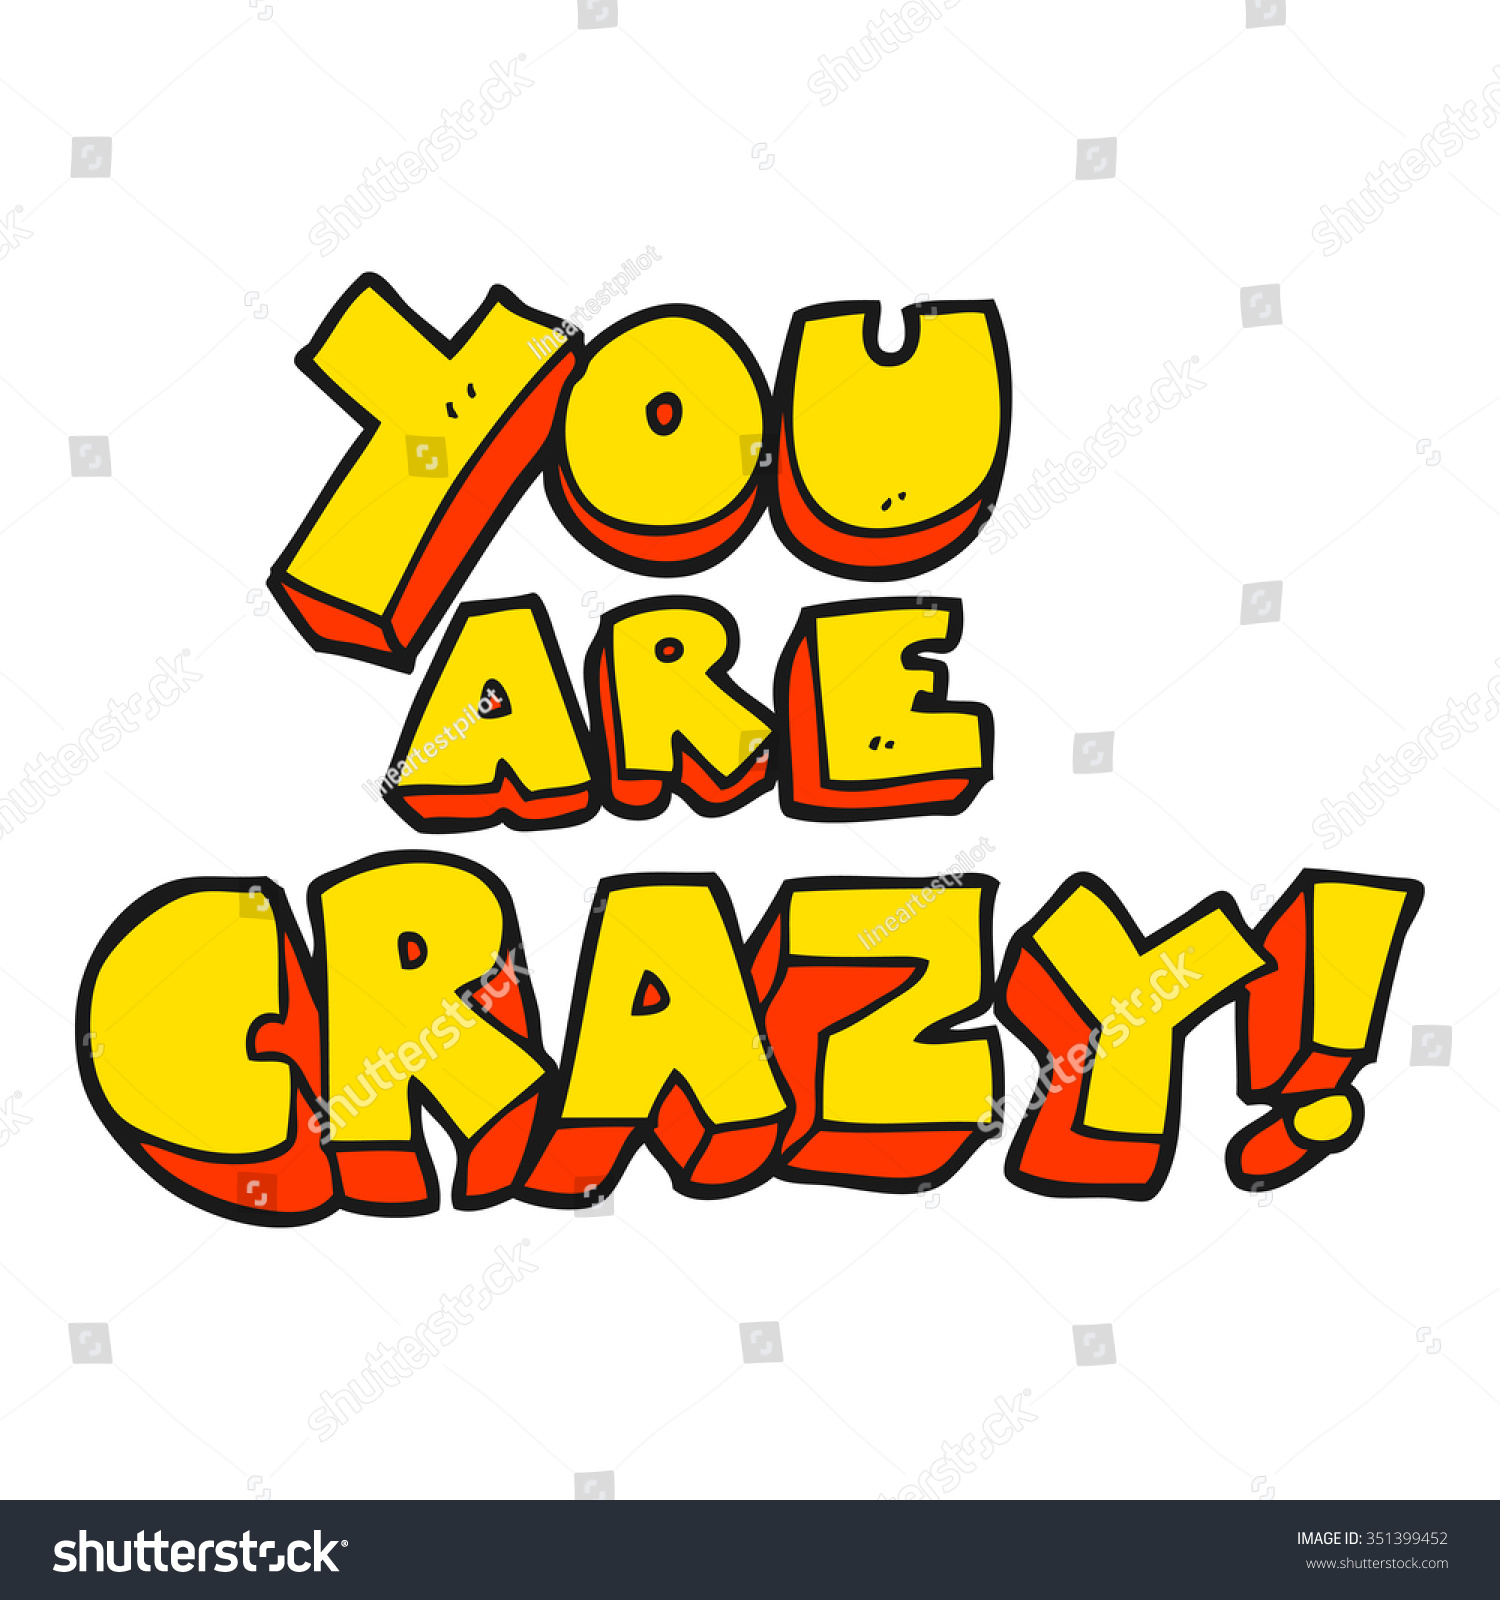 You crazy freehand drawn cartoon symbol stock vector 351399452 you are crazy freehand drawn cartoon symbol biocorpaavc